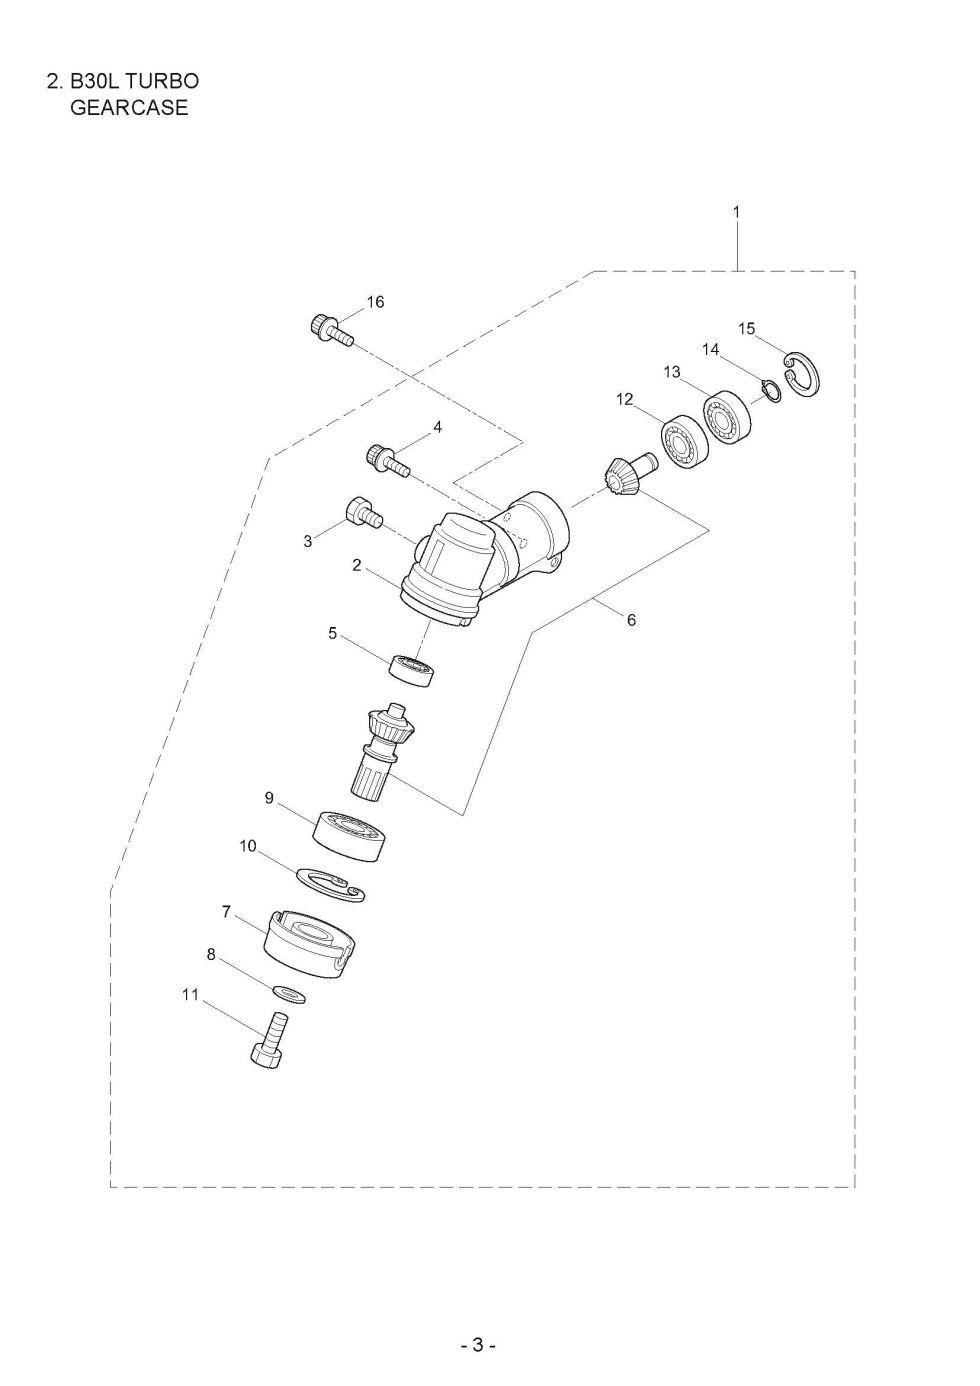 Maruyama Parts Lookup - B30L TURBO Parts Diagrams B30L TURBO